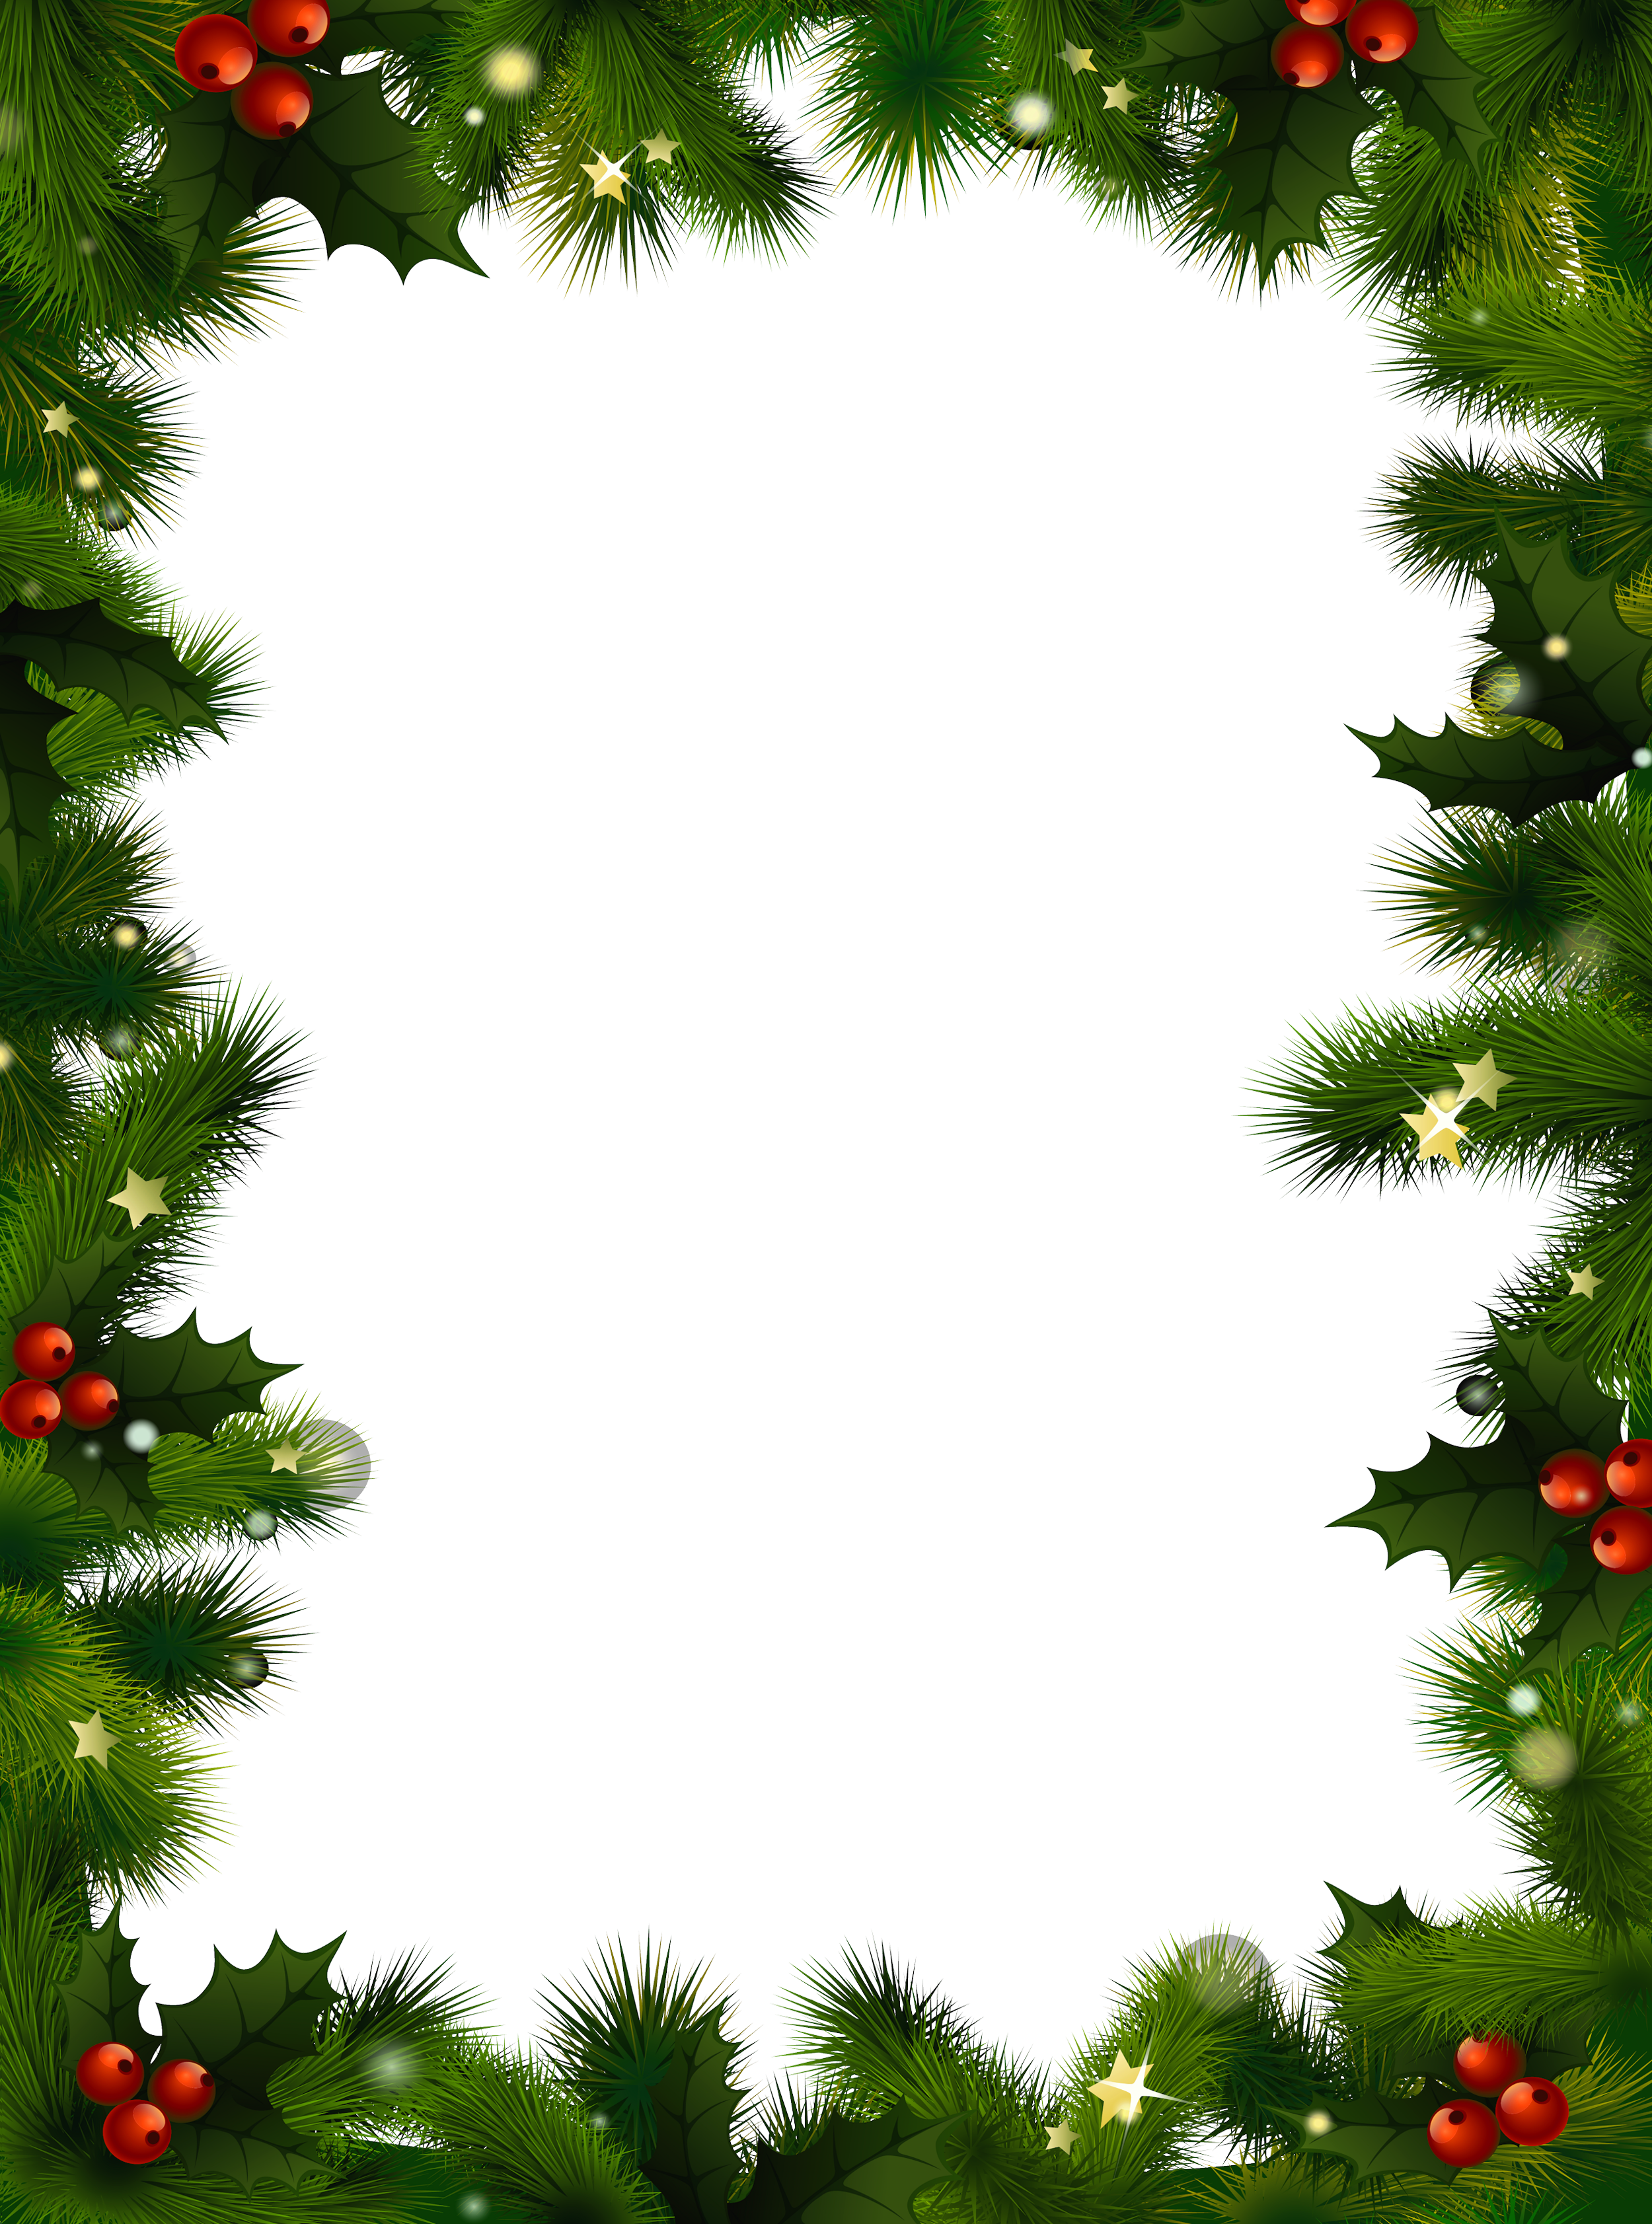 banner stock Mistletoe clipart frame. Transparent christmas photo with.